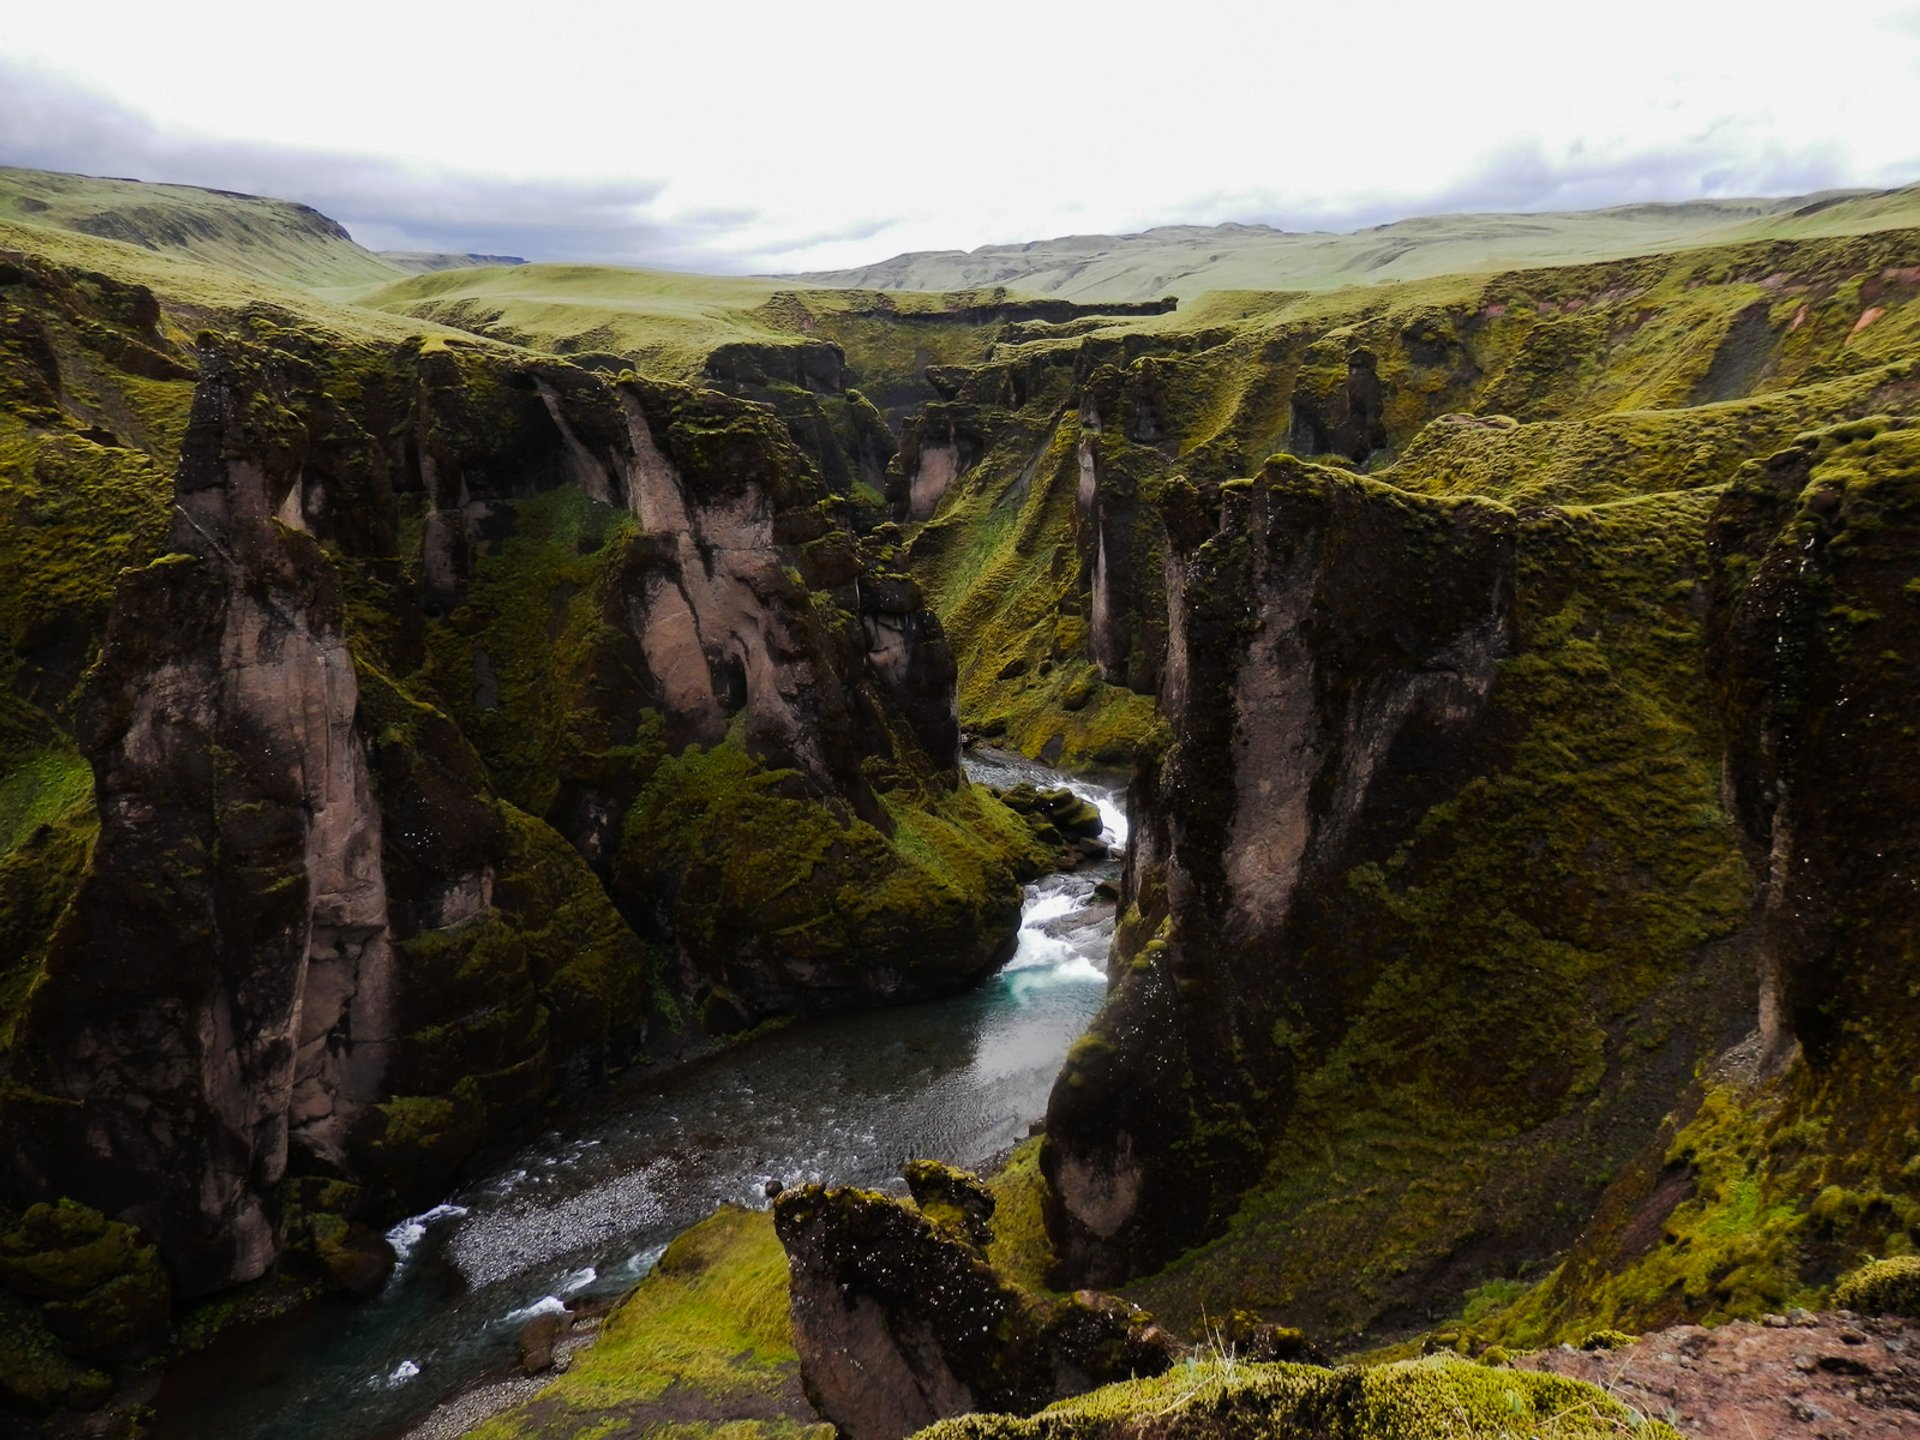 Fjaðrárgljúfur Canyon in Iceland 2020 - Best Time